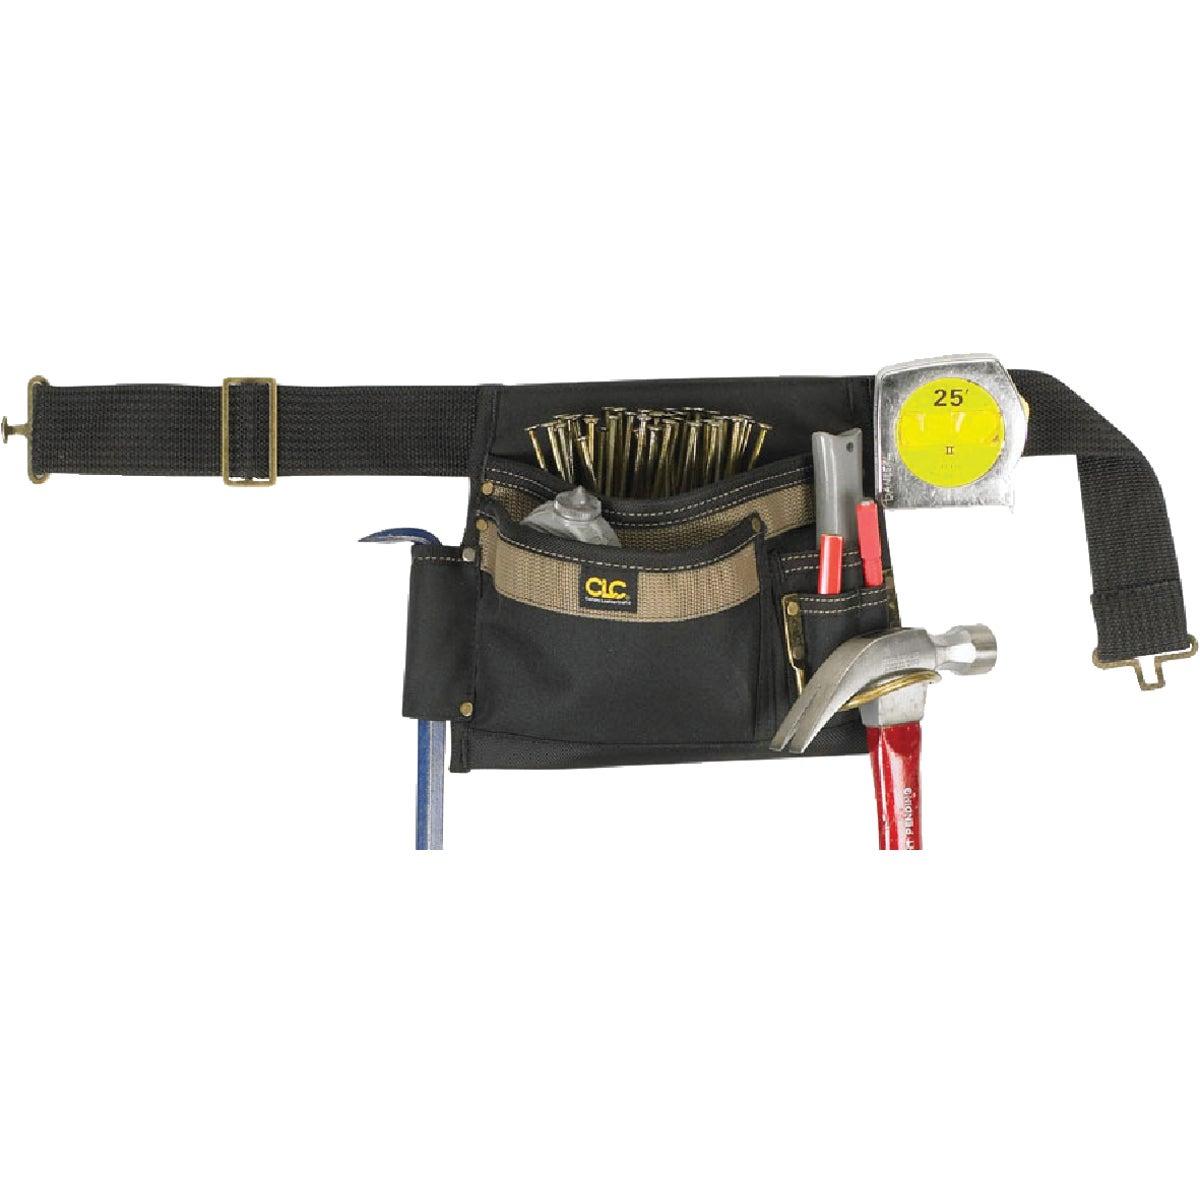 6-POCKET POLY APRON - 1245 by Custom Leathercraft